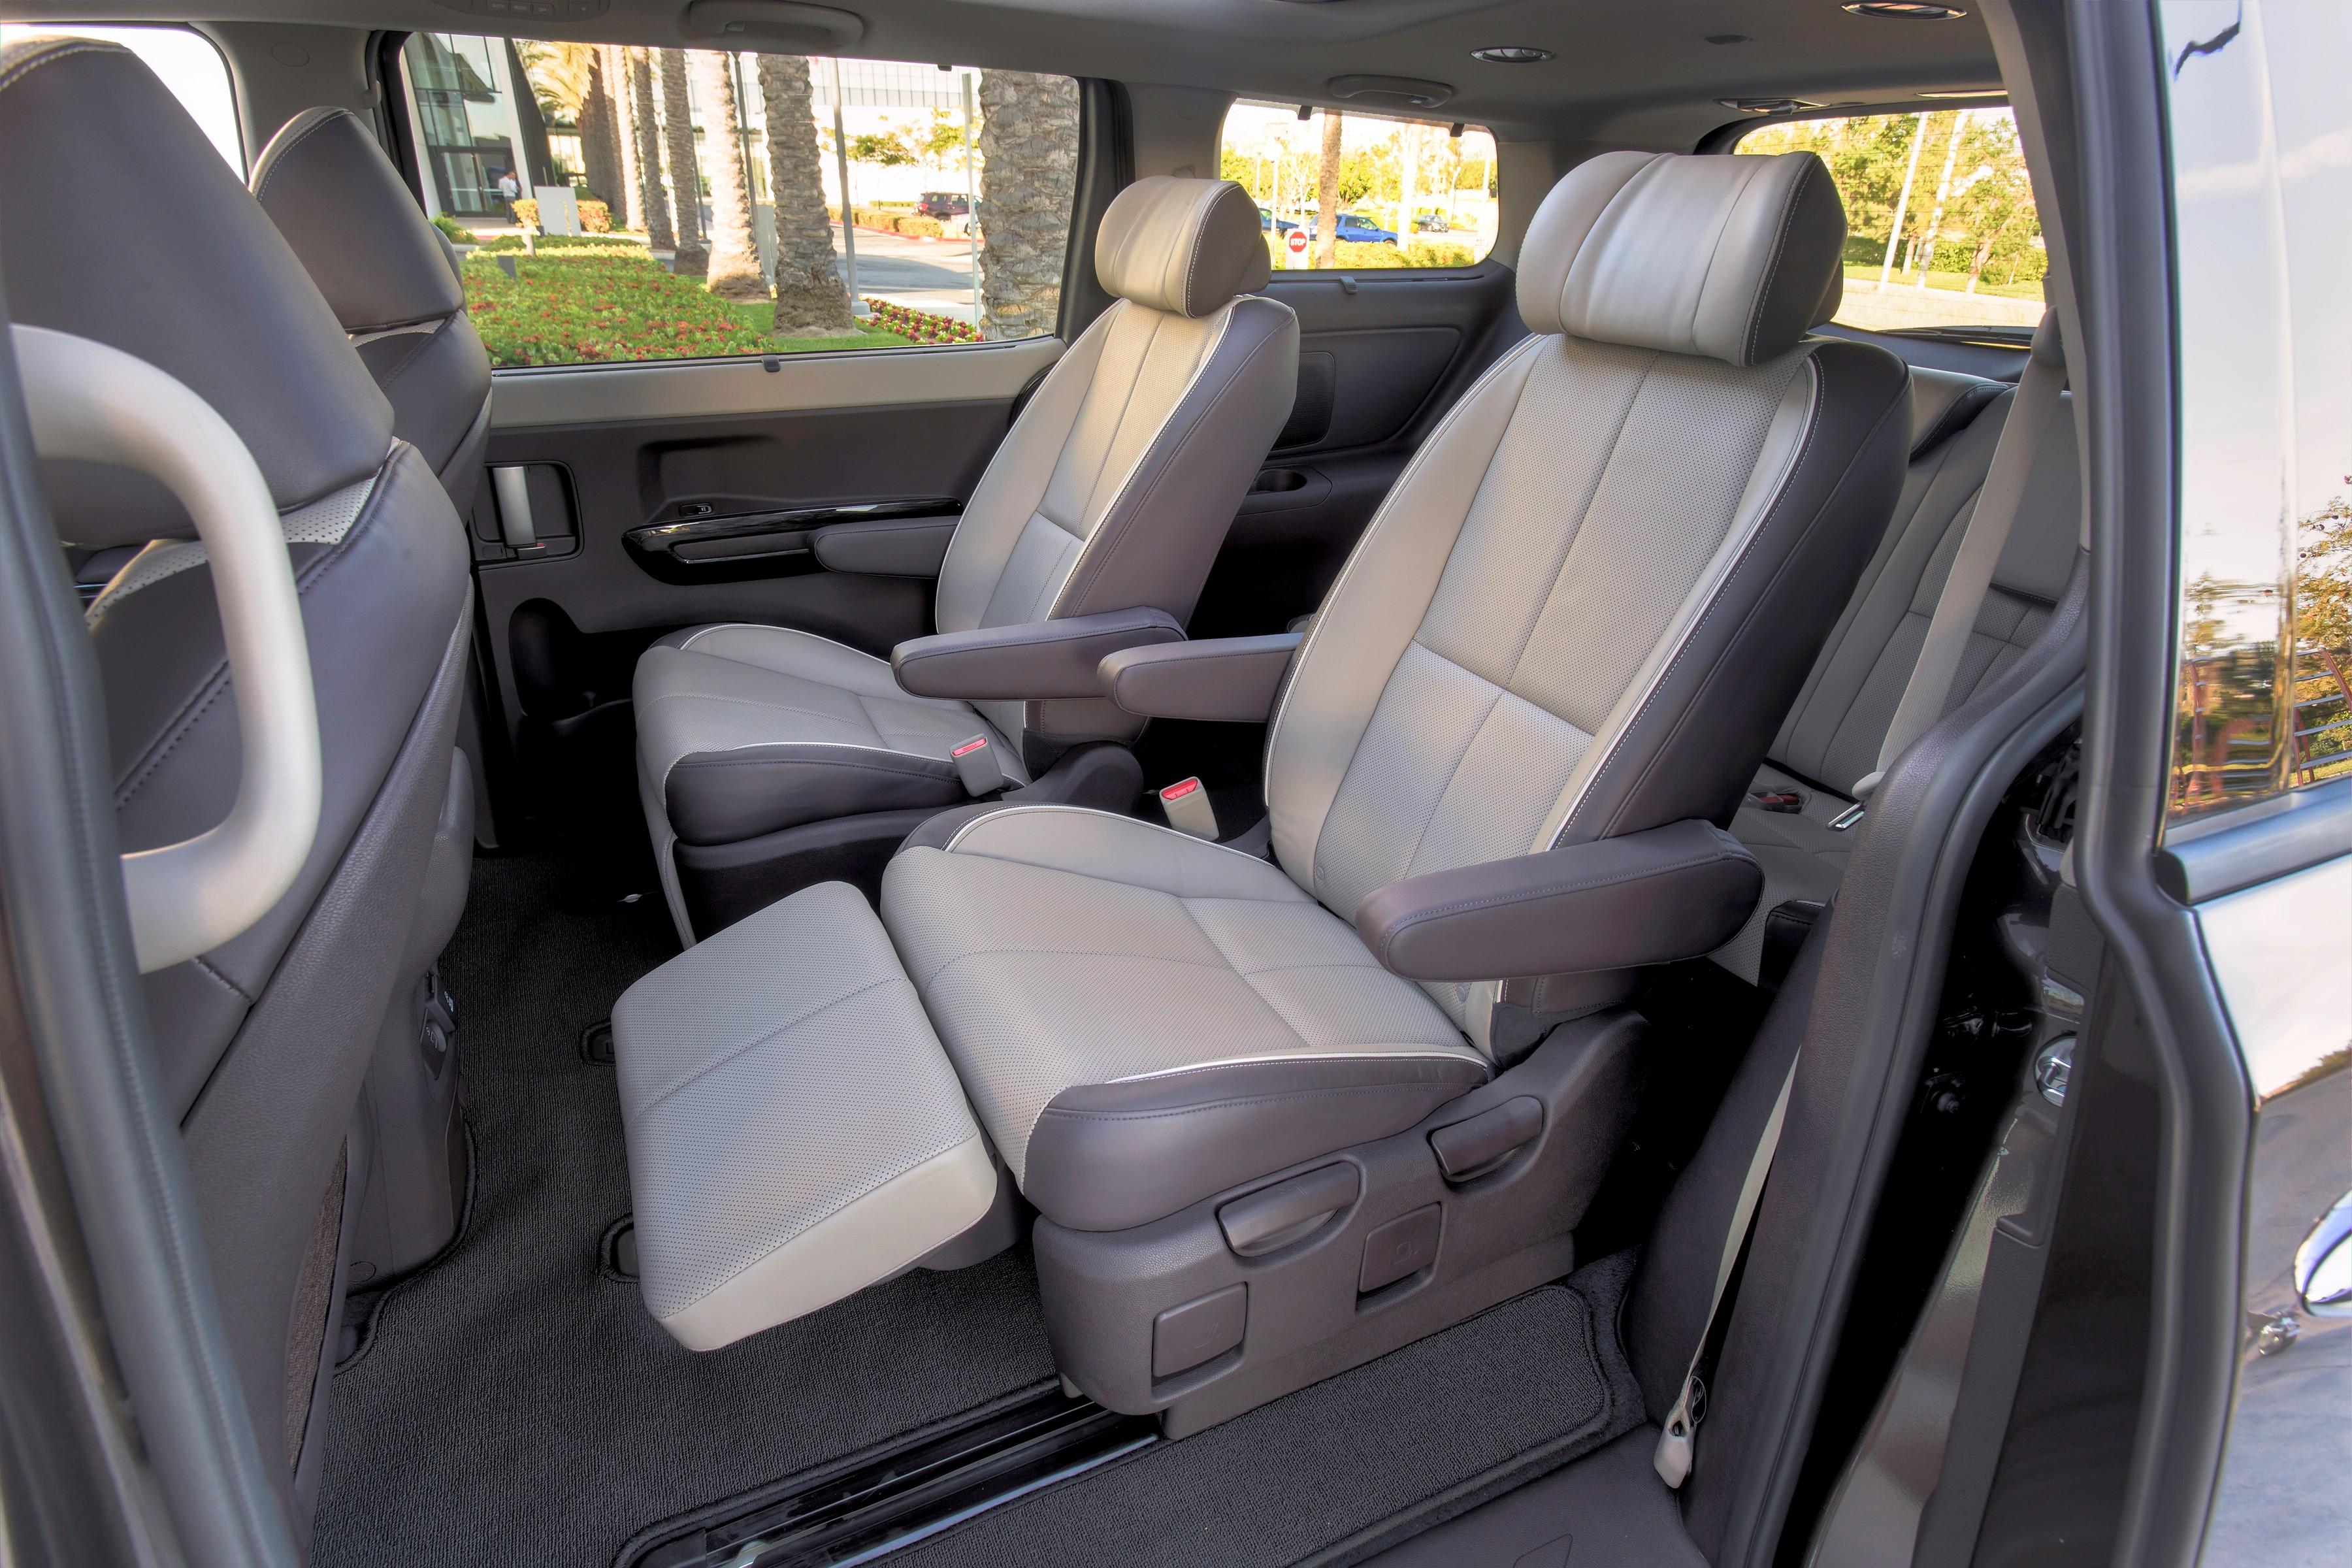 2014 Kia Sedona First Class Seats